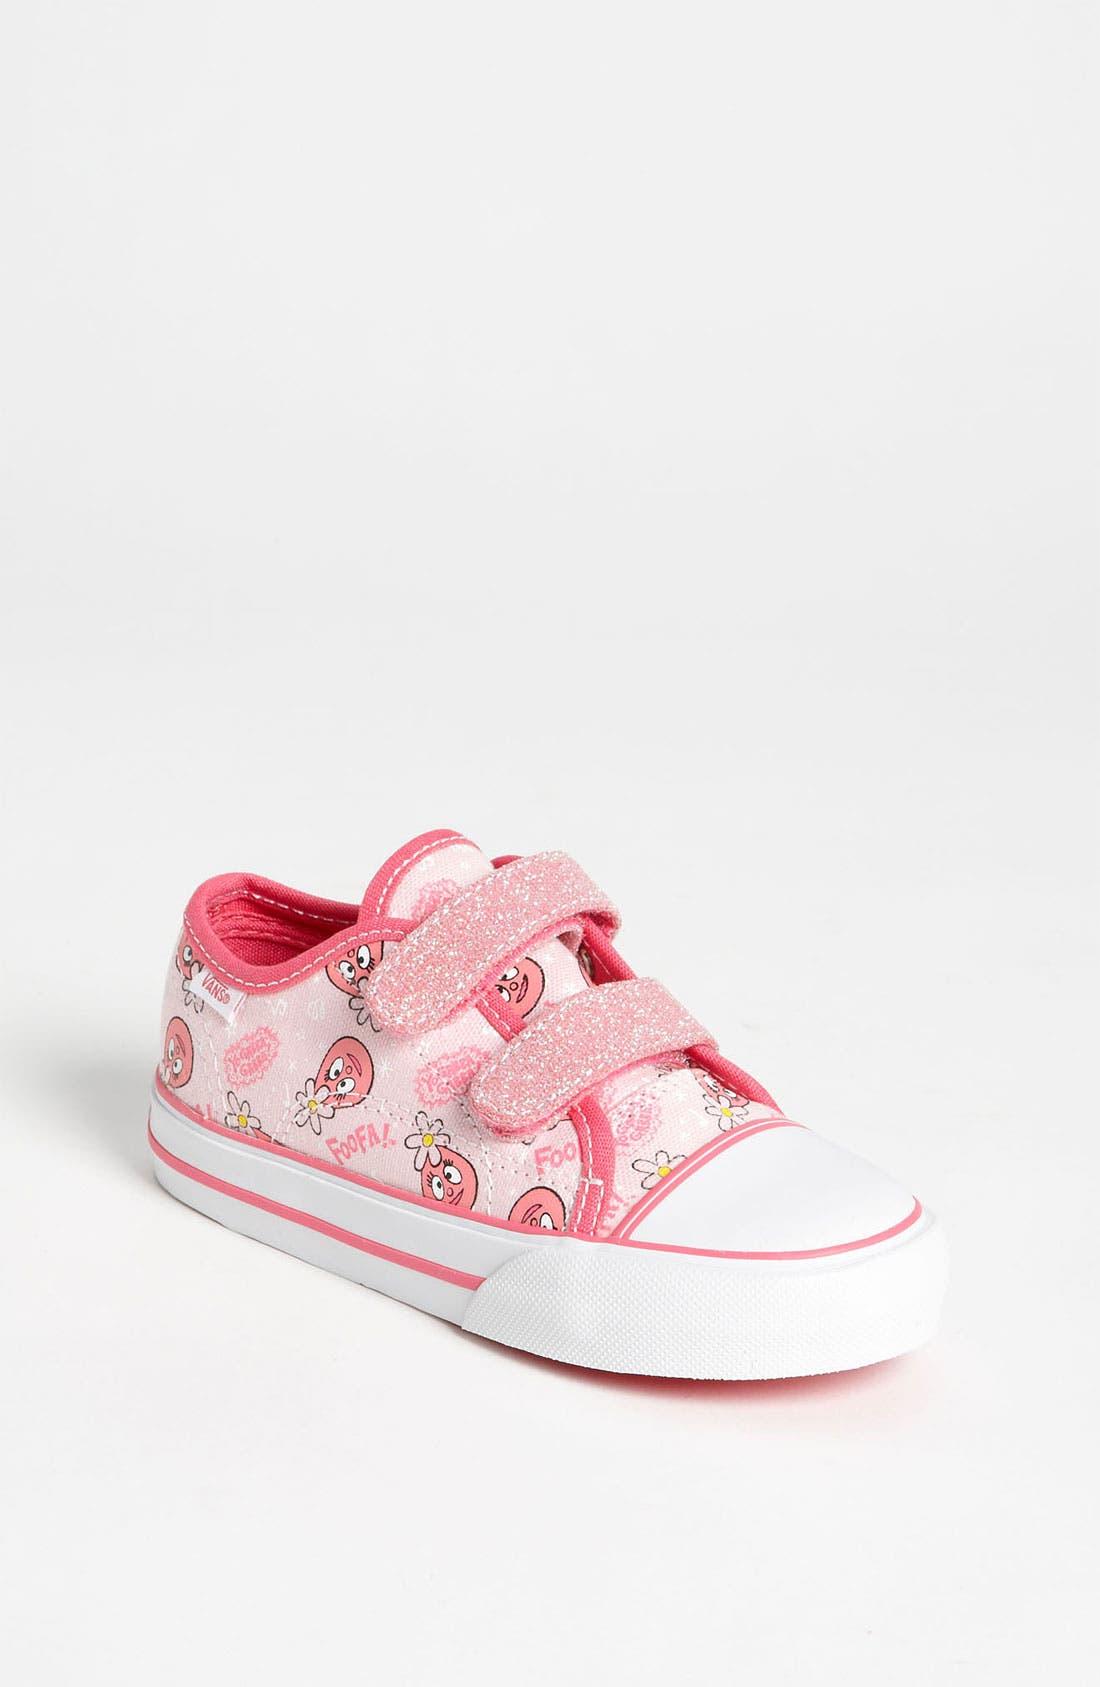 Main Image - Vans 'Big School - Yo Gabba Gabba!' Sneaker (Baby, Walker & Toddler)